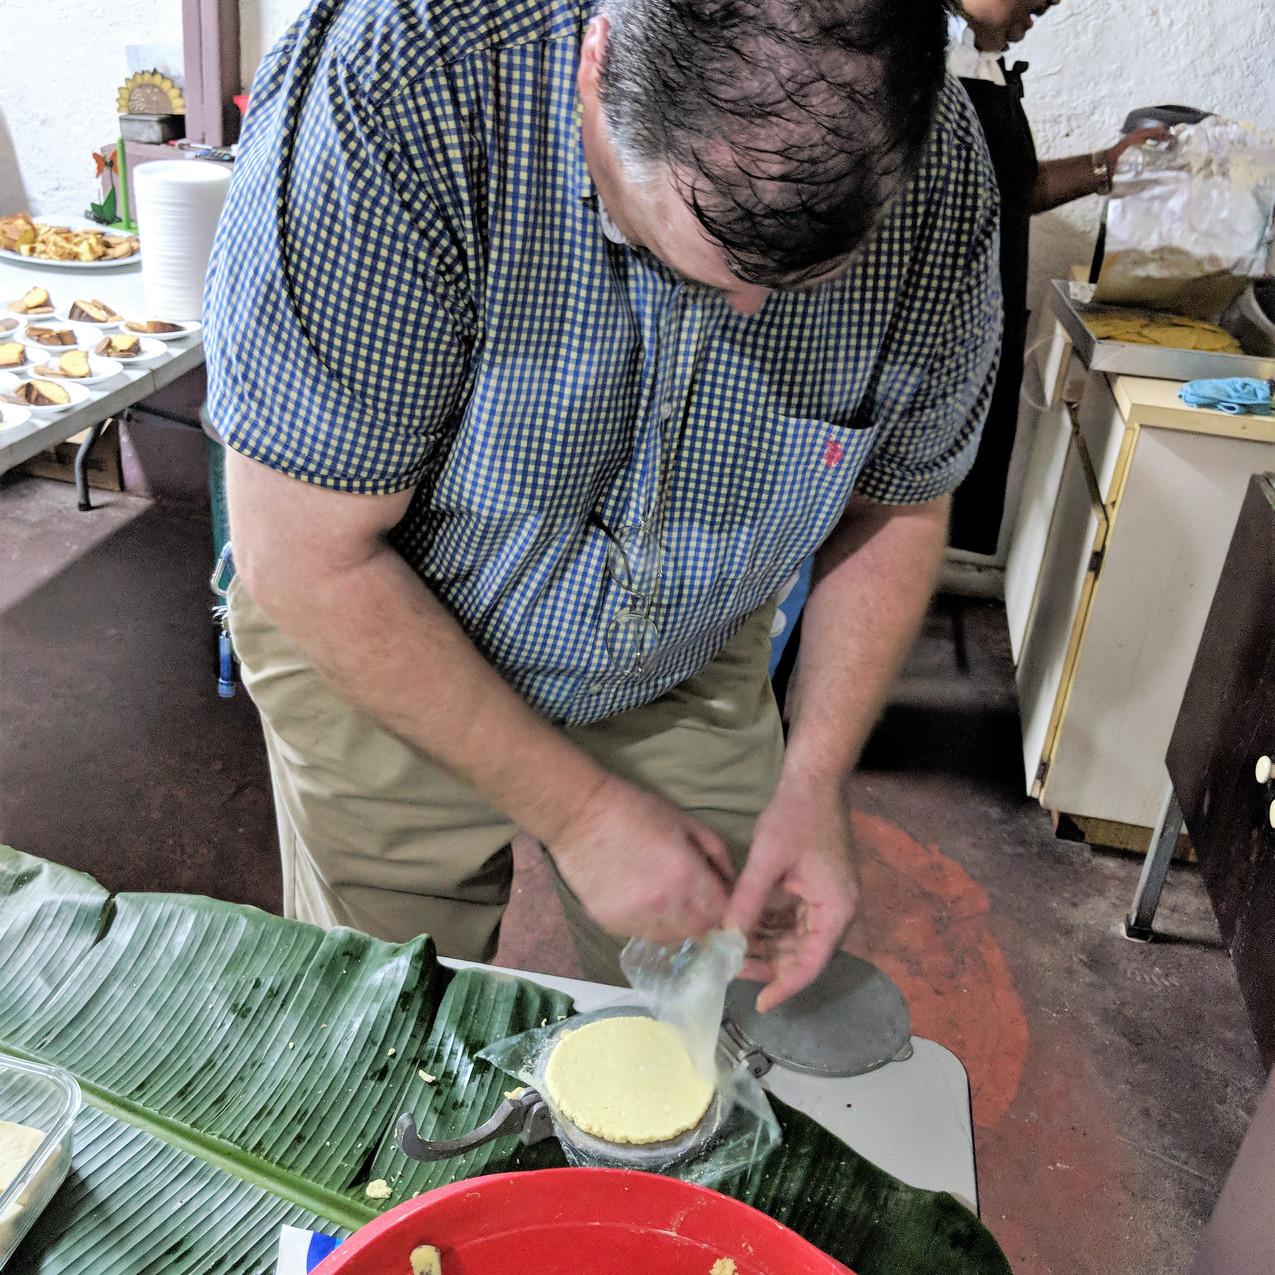 Kevin helps make tortillas